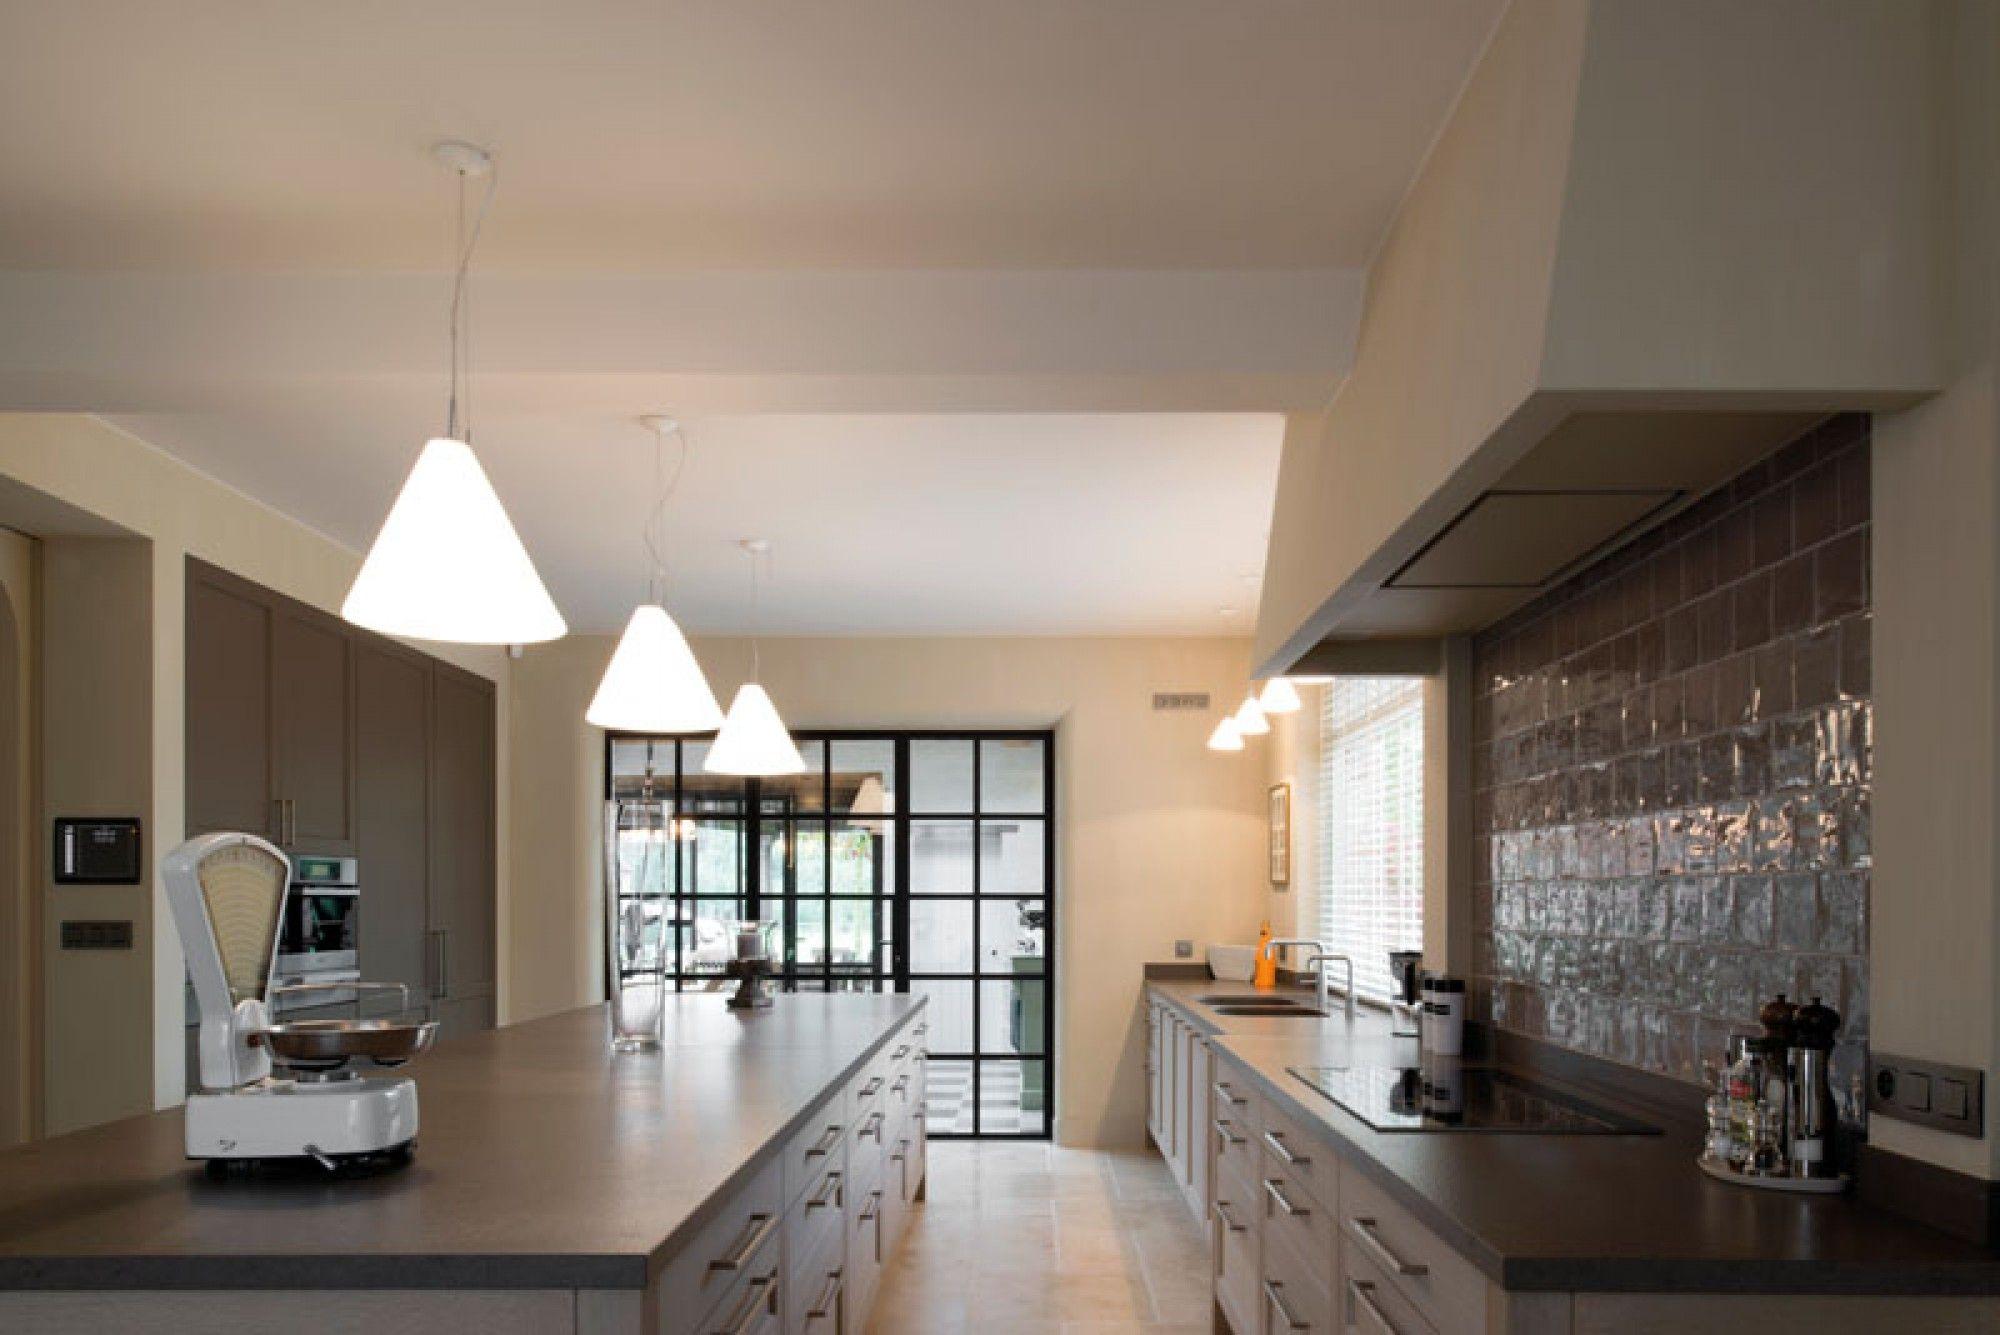 Küchenideen rustikal modern home sweet home  zeven jaar bouwen met hout en steen  keuken